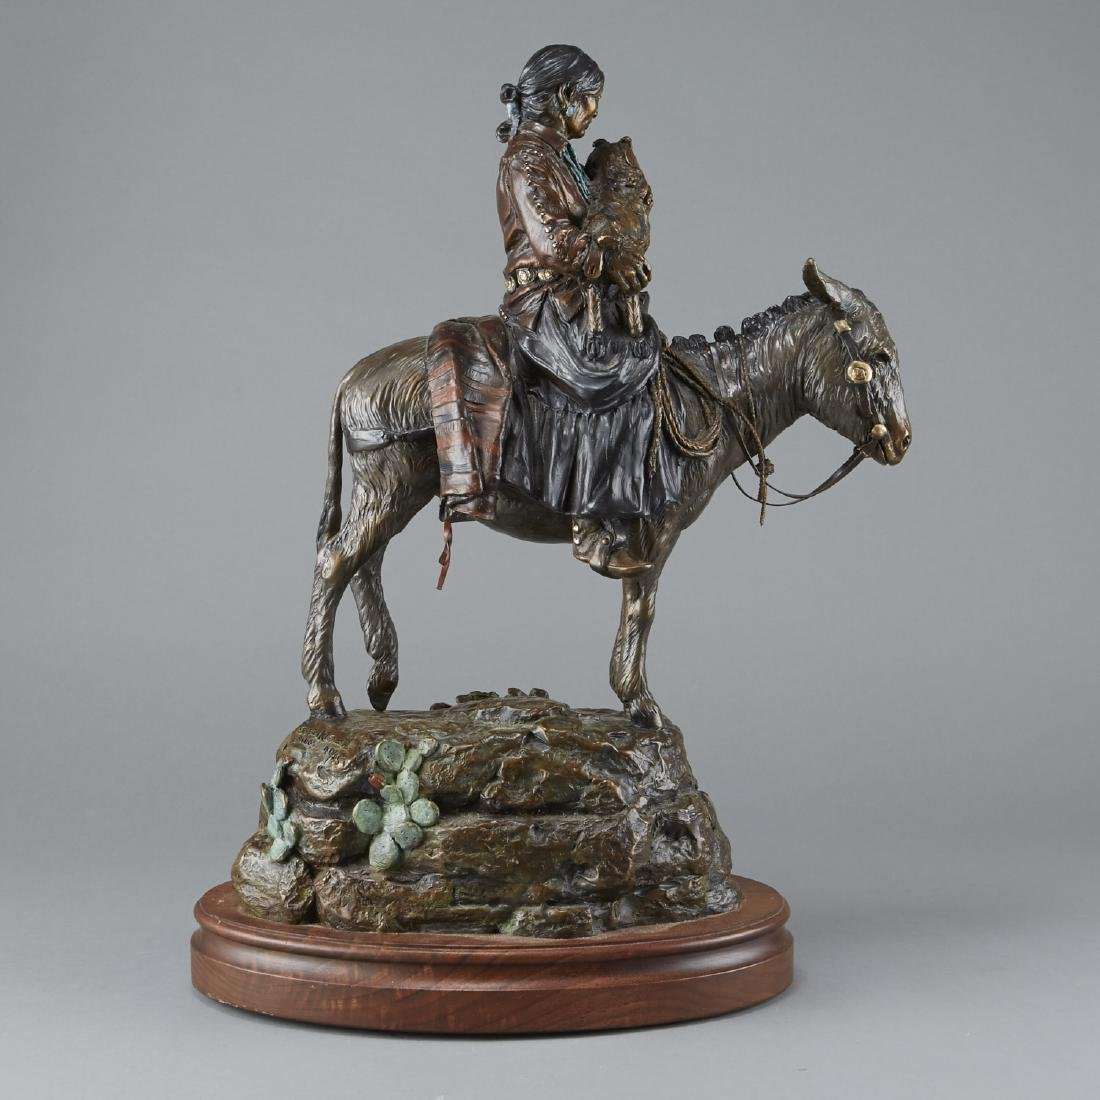 Susan Kliewer Bronze of Woman on Horseback - 3